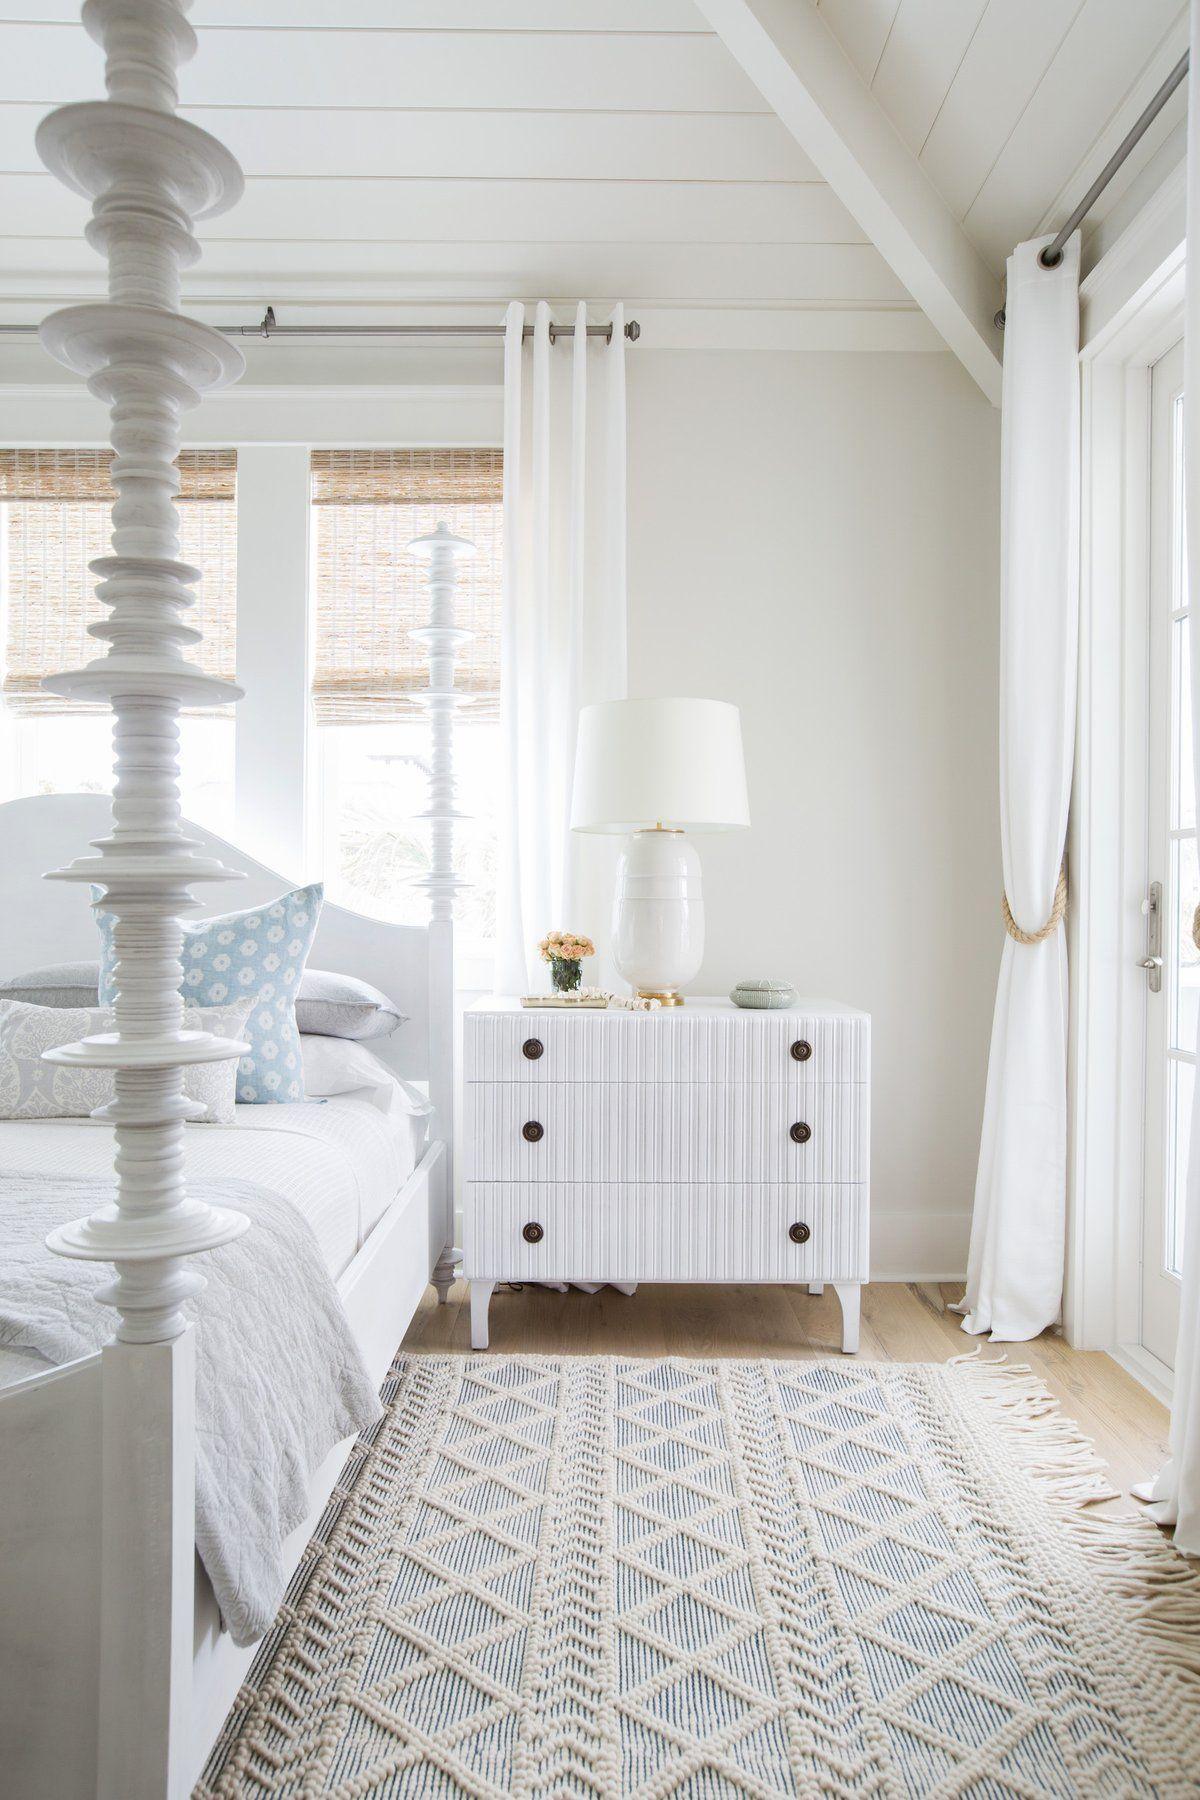 60798663707226072 in 2020 Home decor, House interior